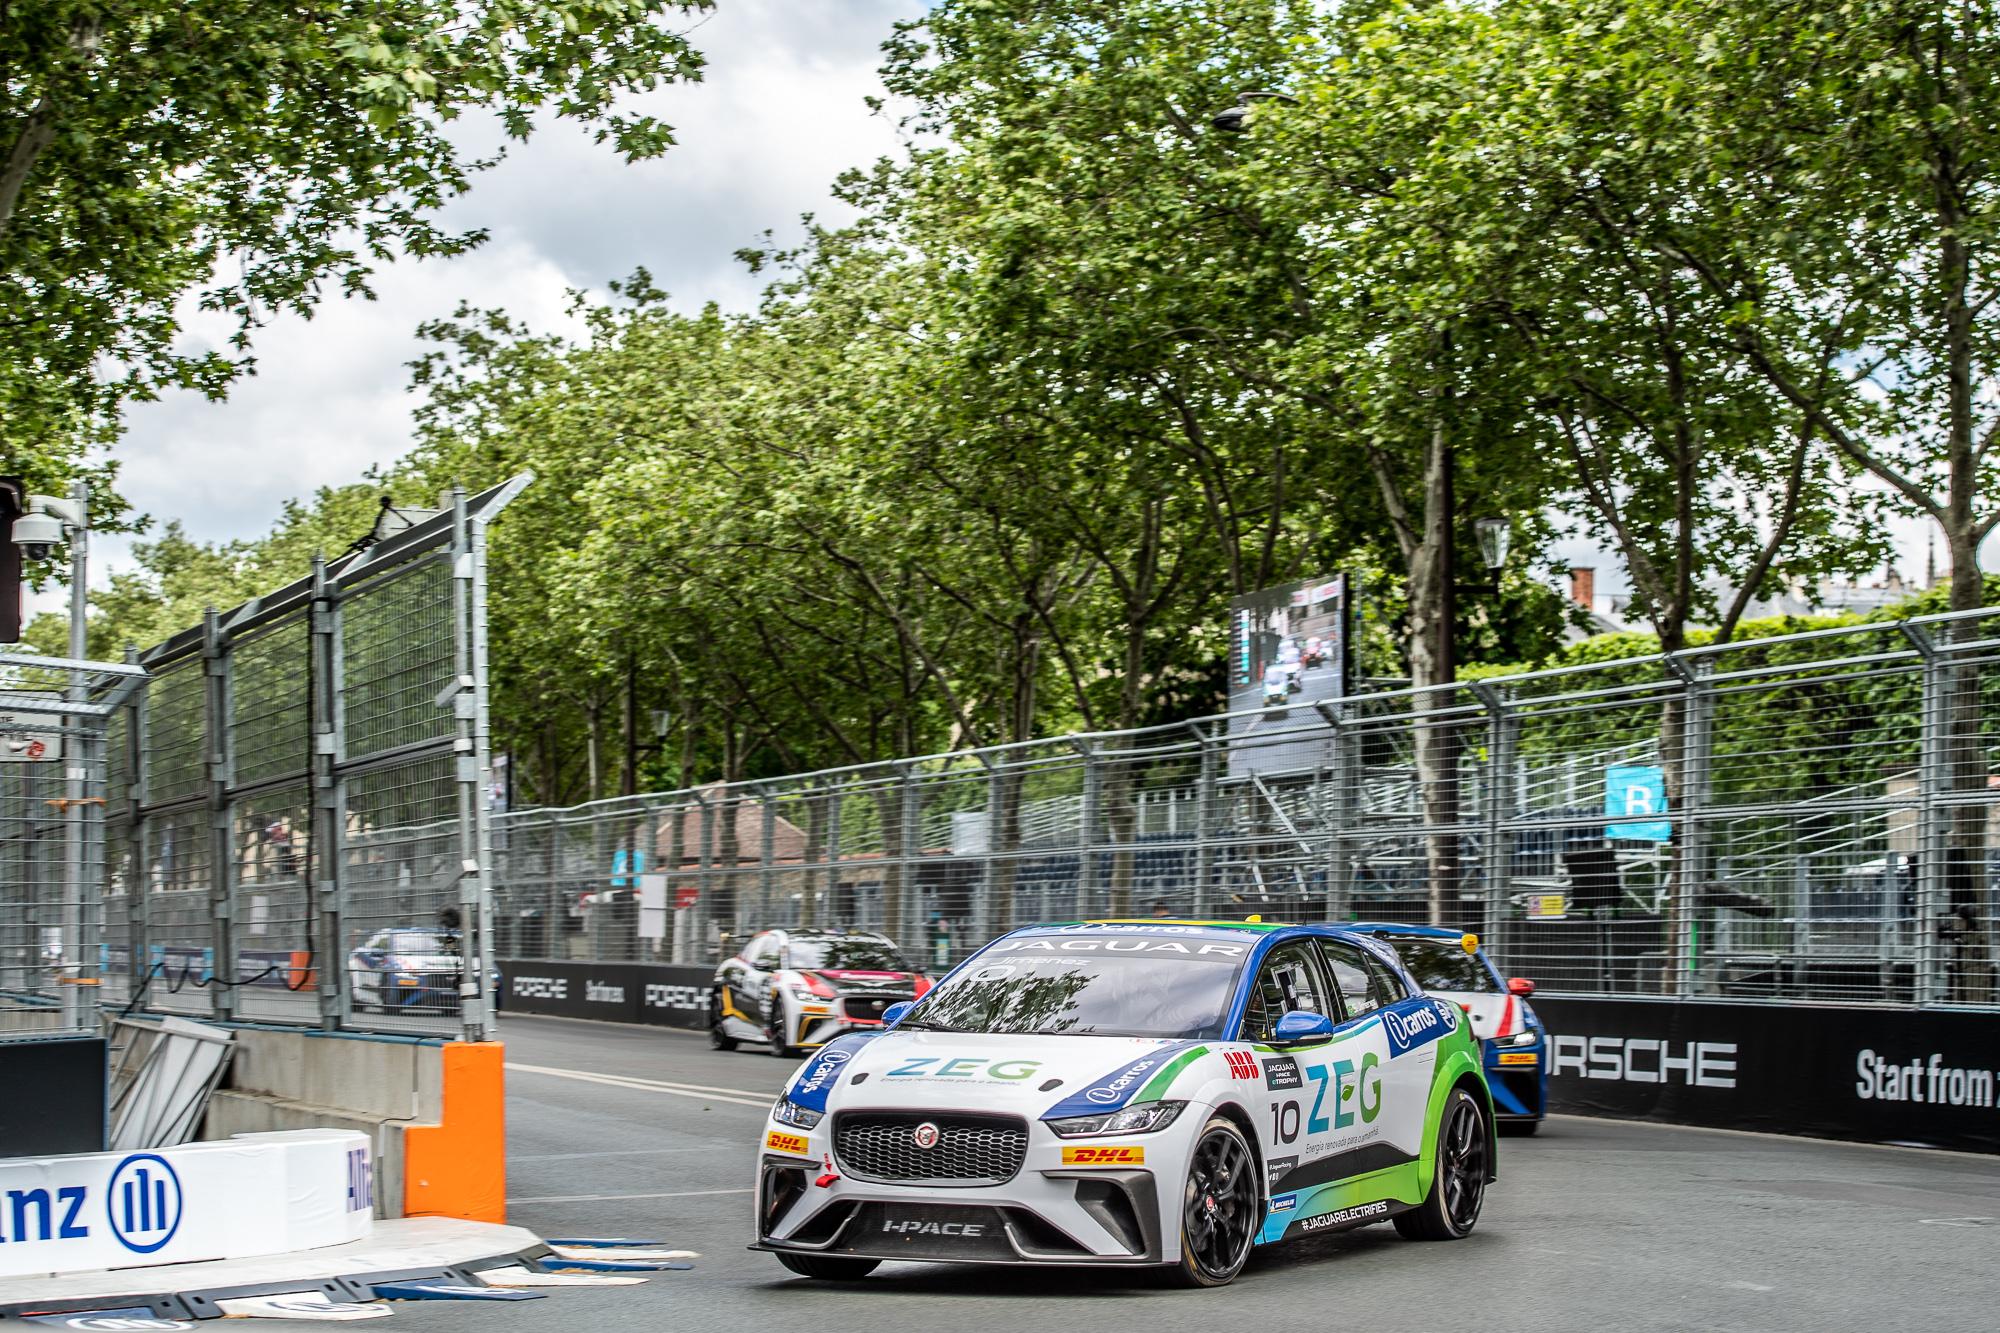 Jaguar_6.Paris_josemariodias_04026